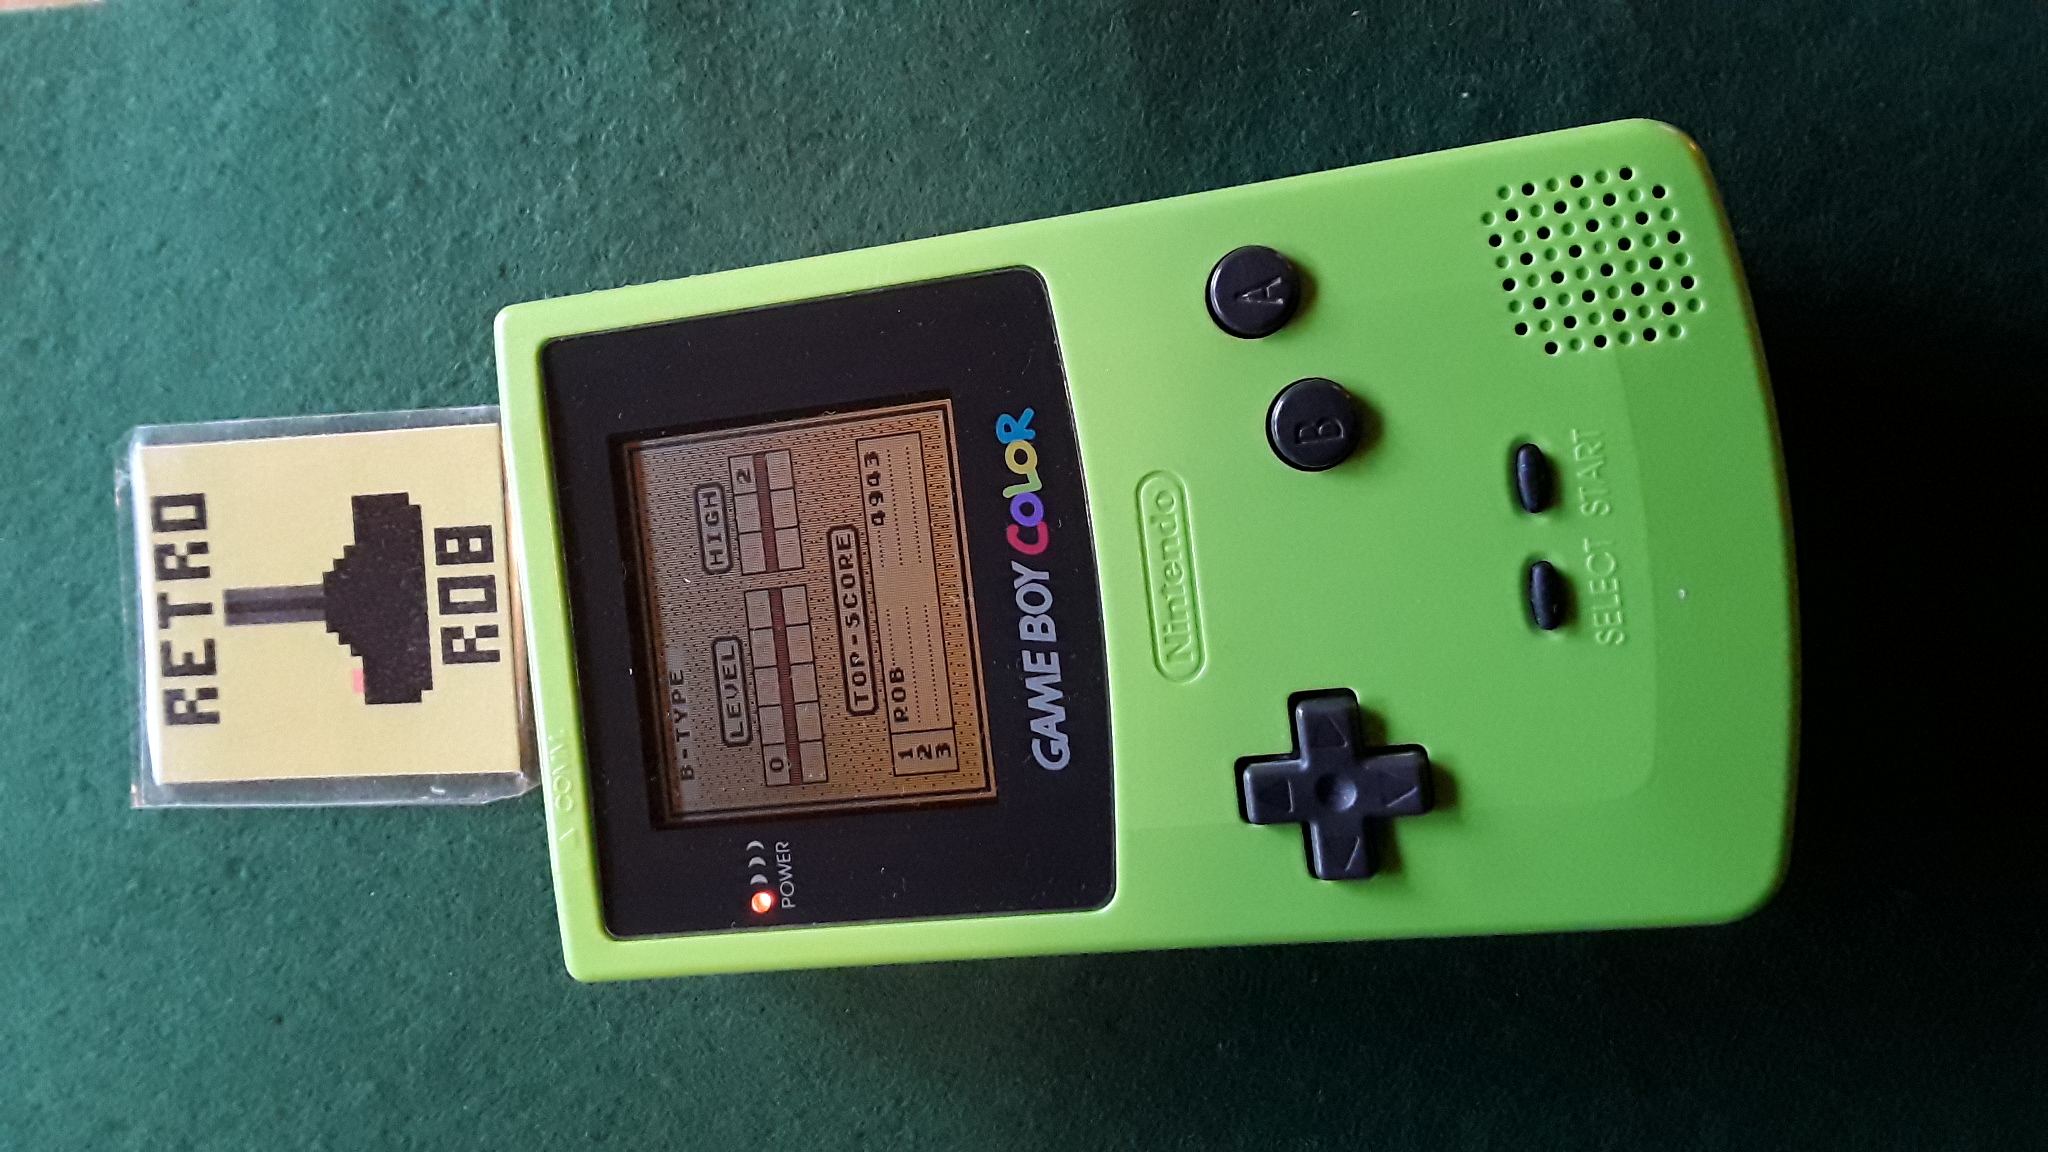 RetroRob: Tetris: Type B [Level 0 / High 2] (Game Boy) 4,943 points on 2020-10-03 08:07:34